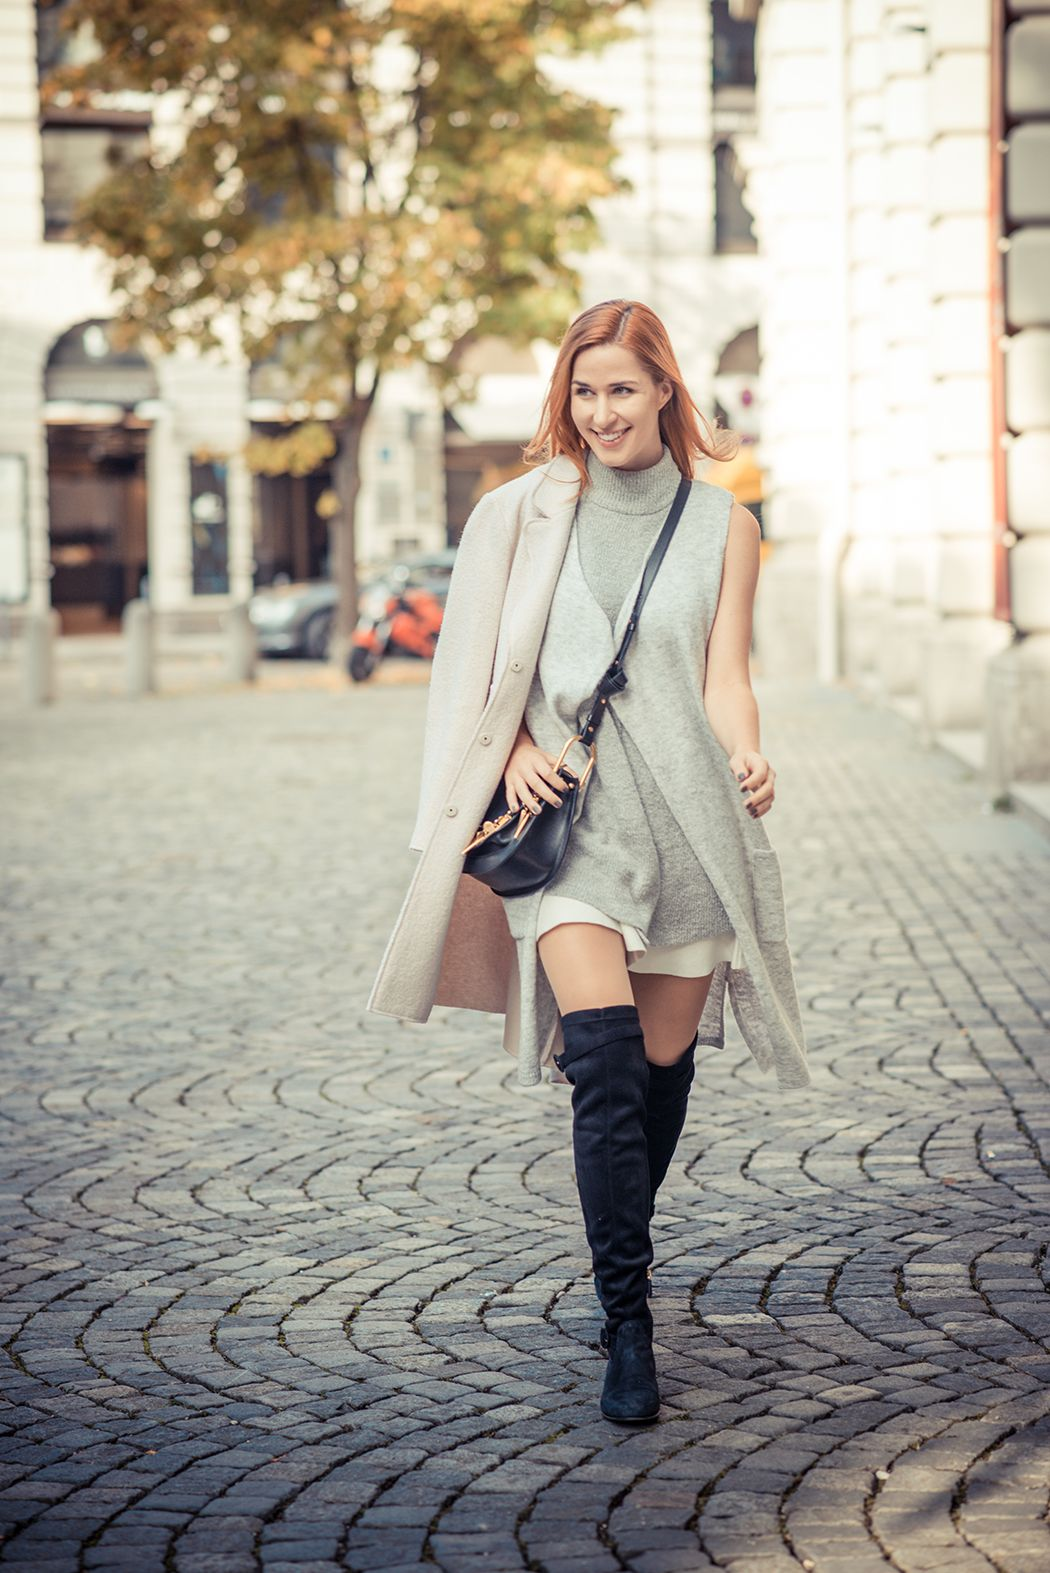 It's overknee season | Lindarella - Fashion- und Fitness Blog aus München